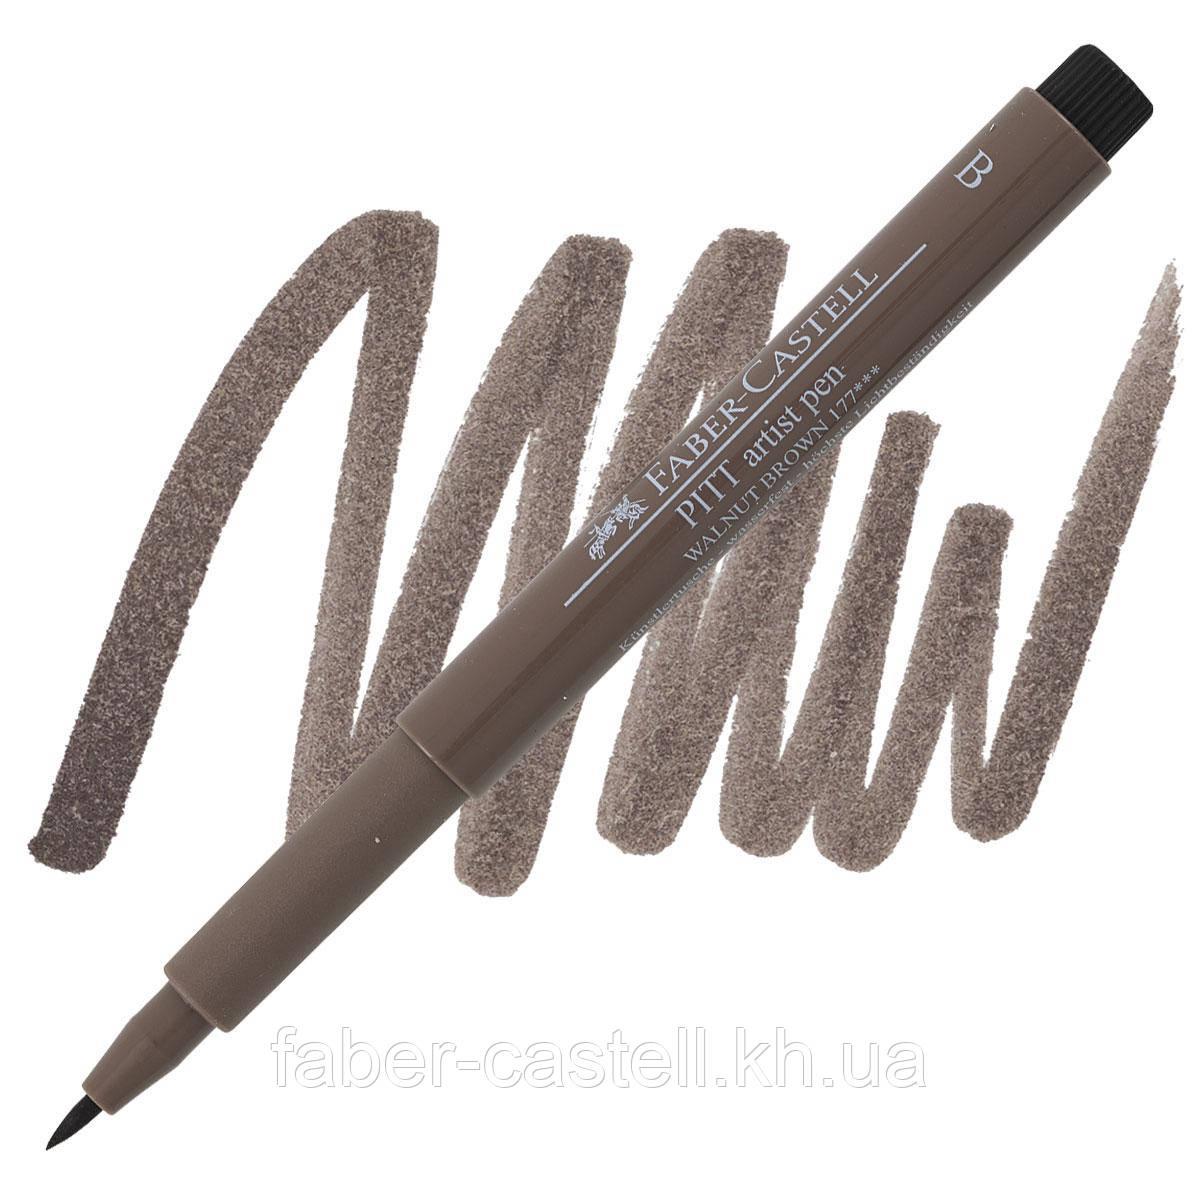 "Ручка-кисточка капиллярная Faber - Castell PITT® ARTIST PEN ""BRUSH"" №177 коричневый орех, 167477"